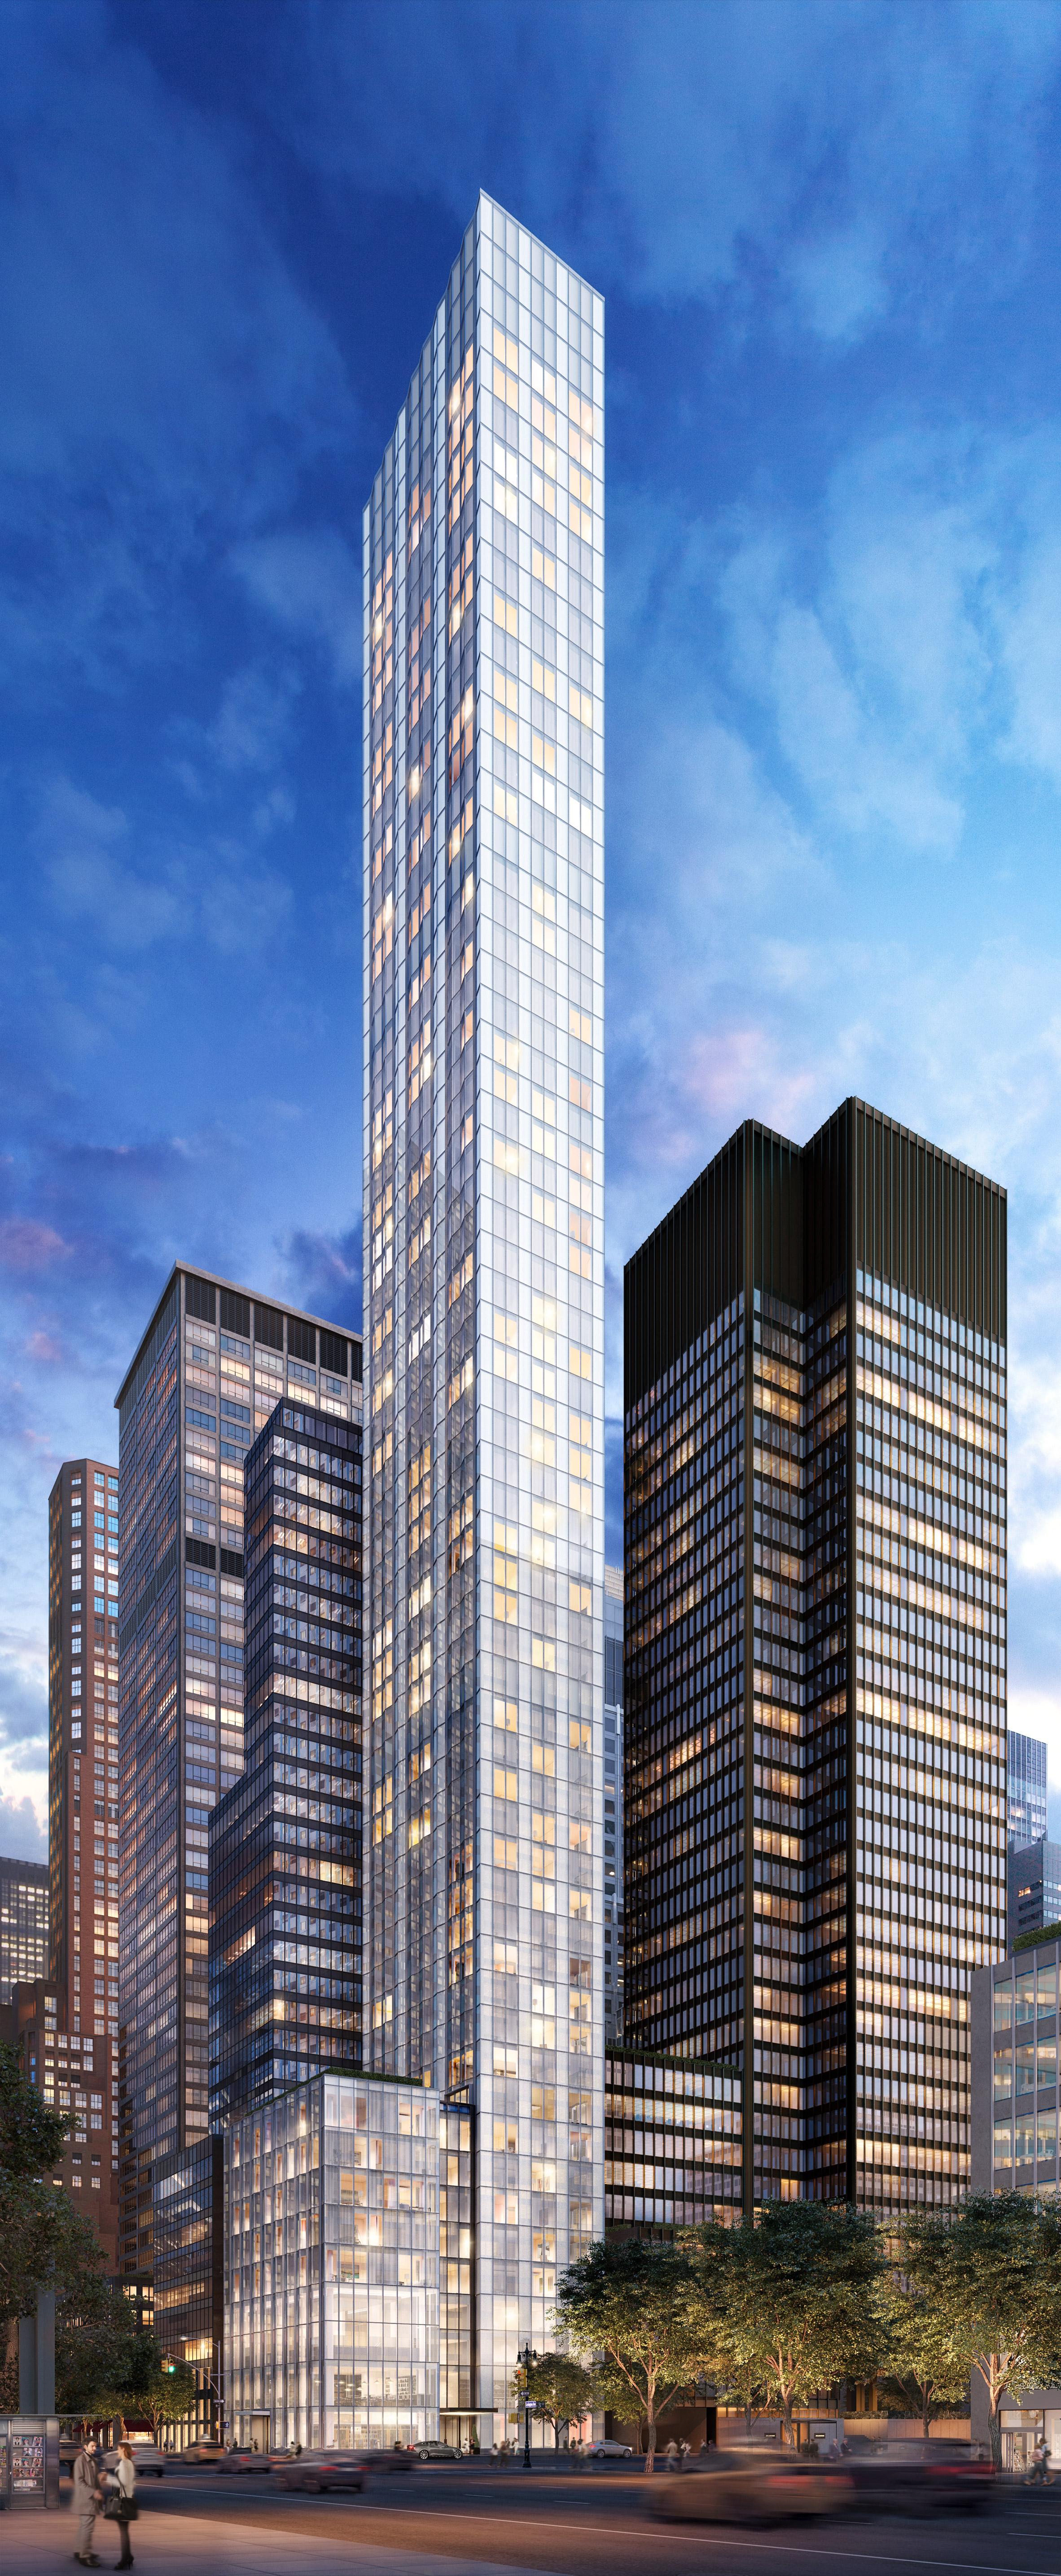 Foster unveils homes for art collectors inside super-skinny New York skyscraper